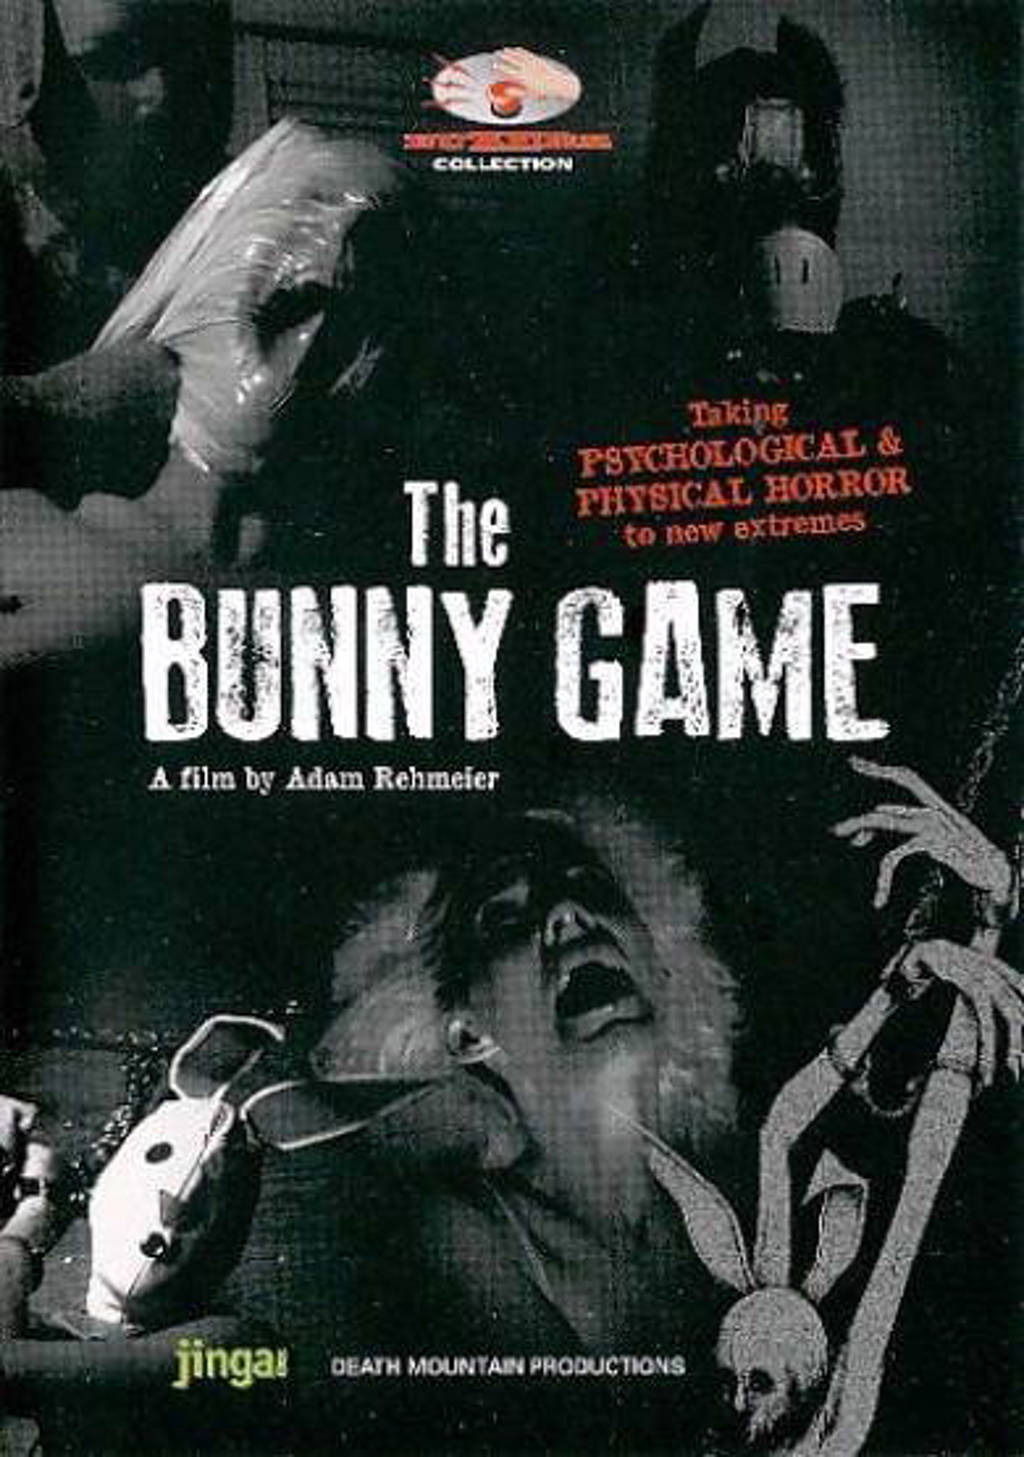 Bunny game (DVD)